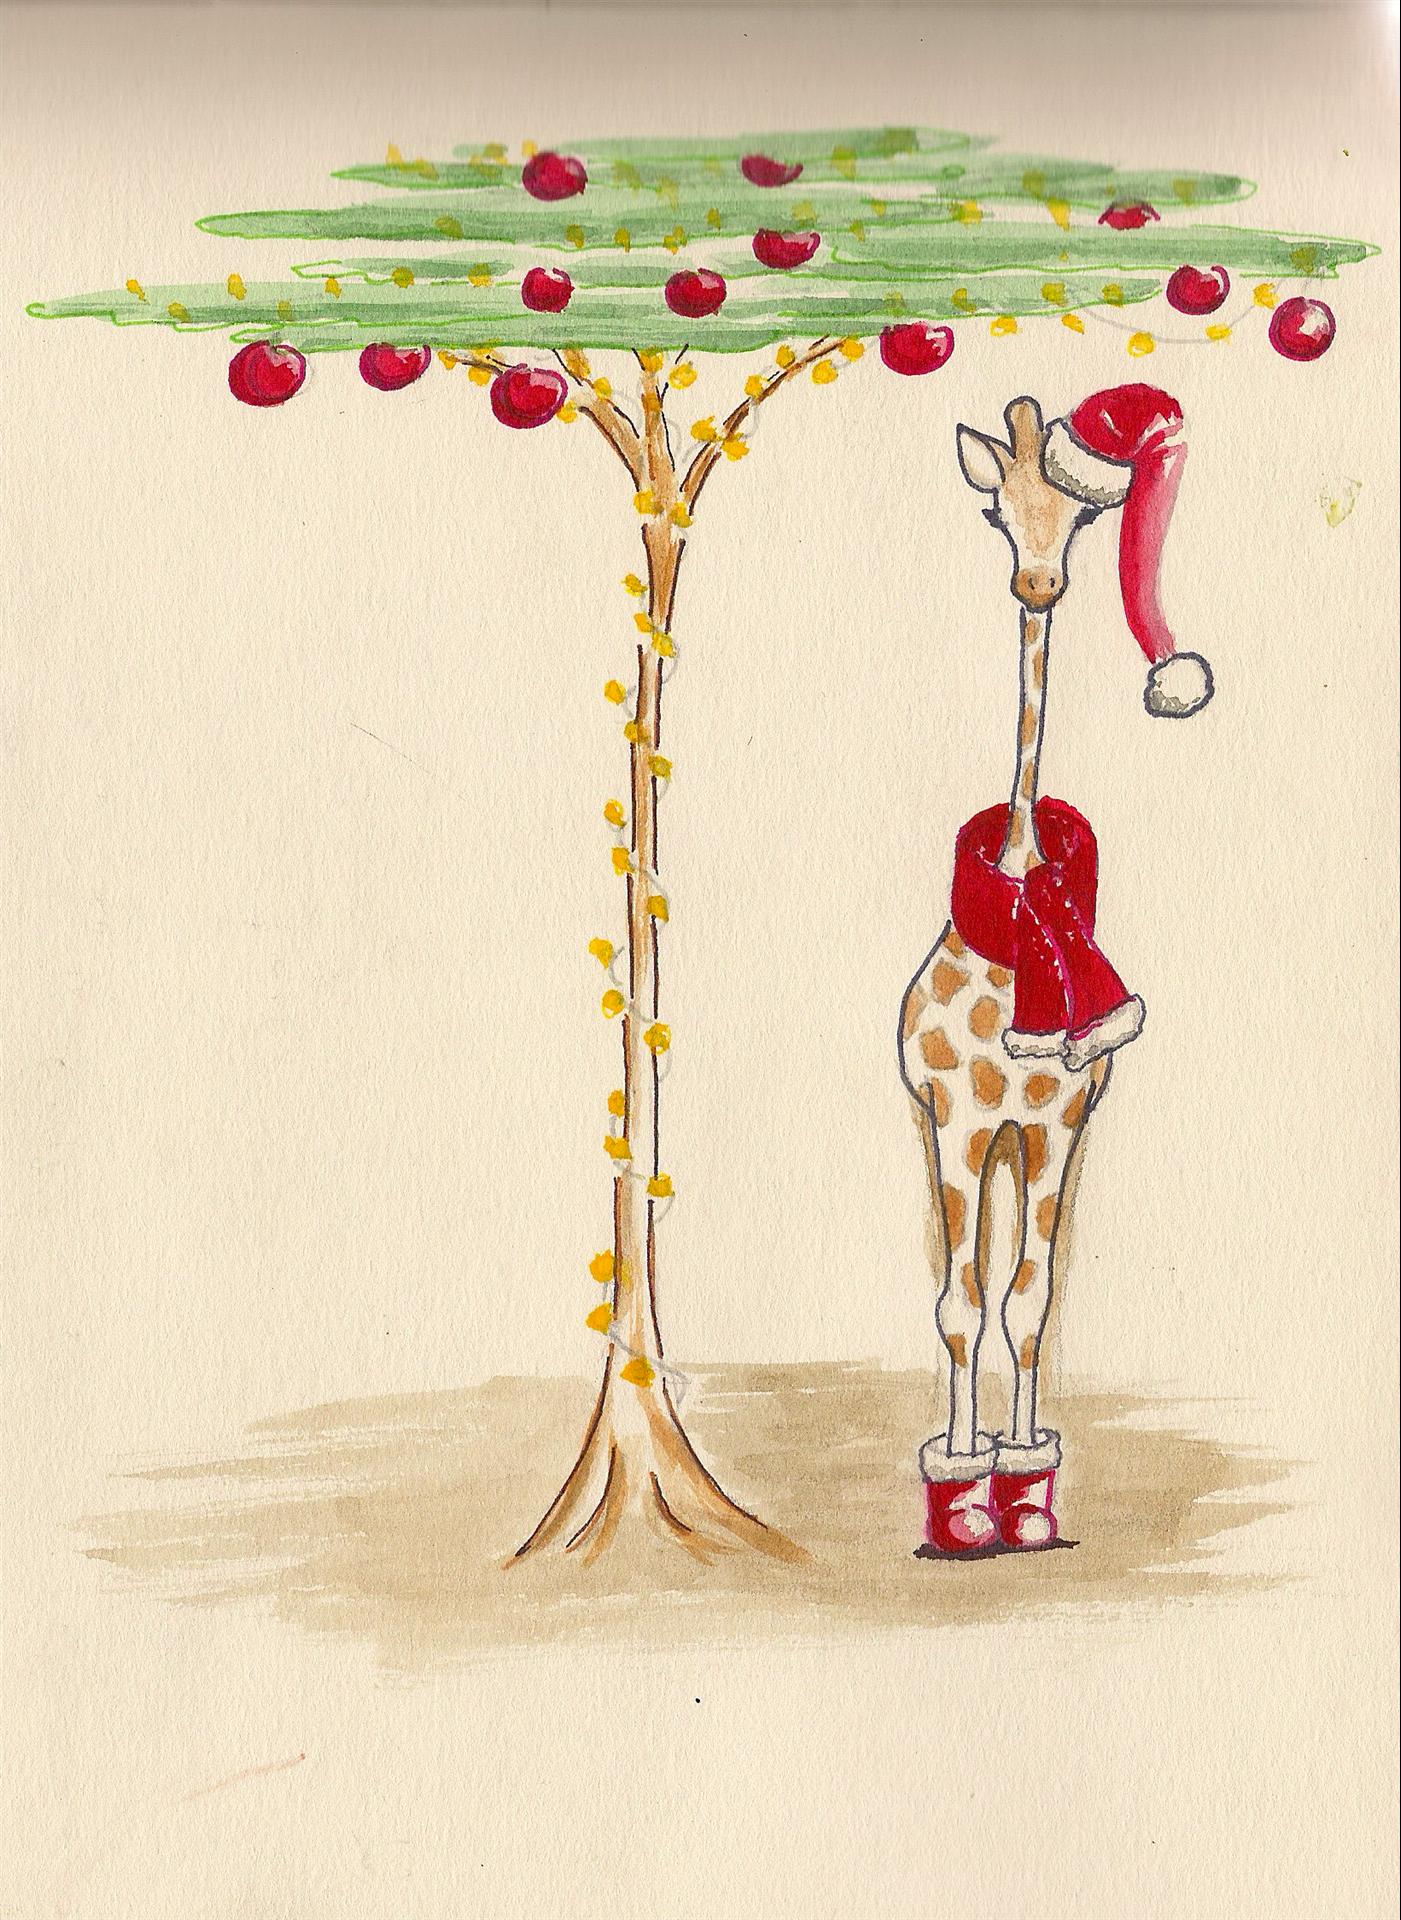 christmas giraffe - Google Search   Xmas   Pinterest   Giraffe ...